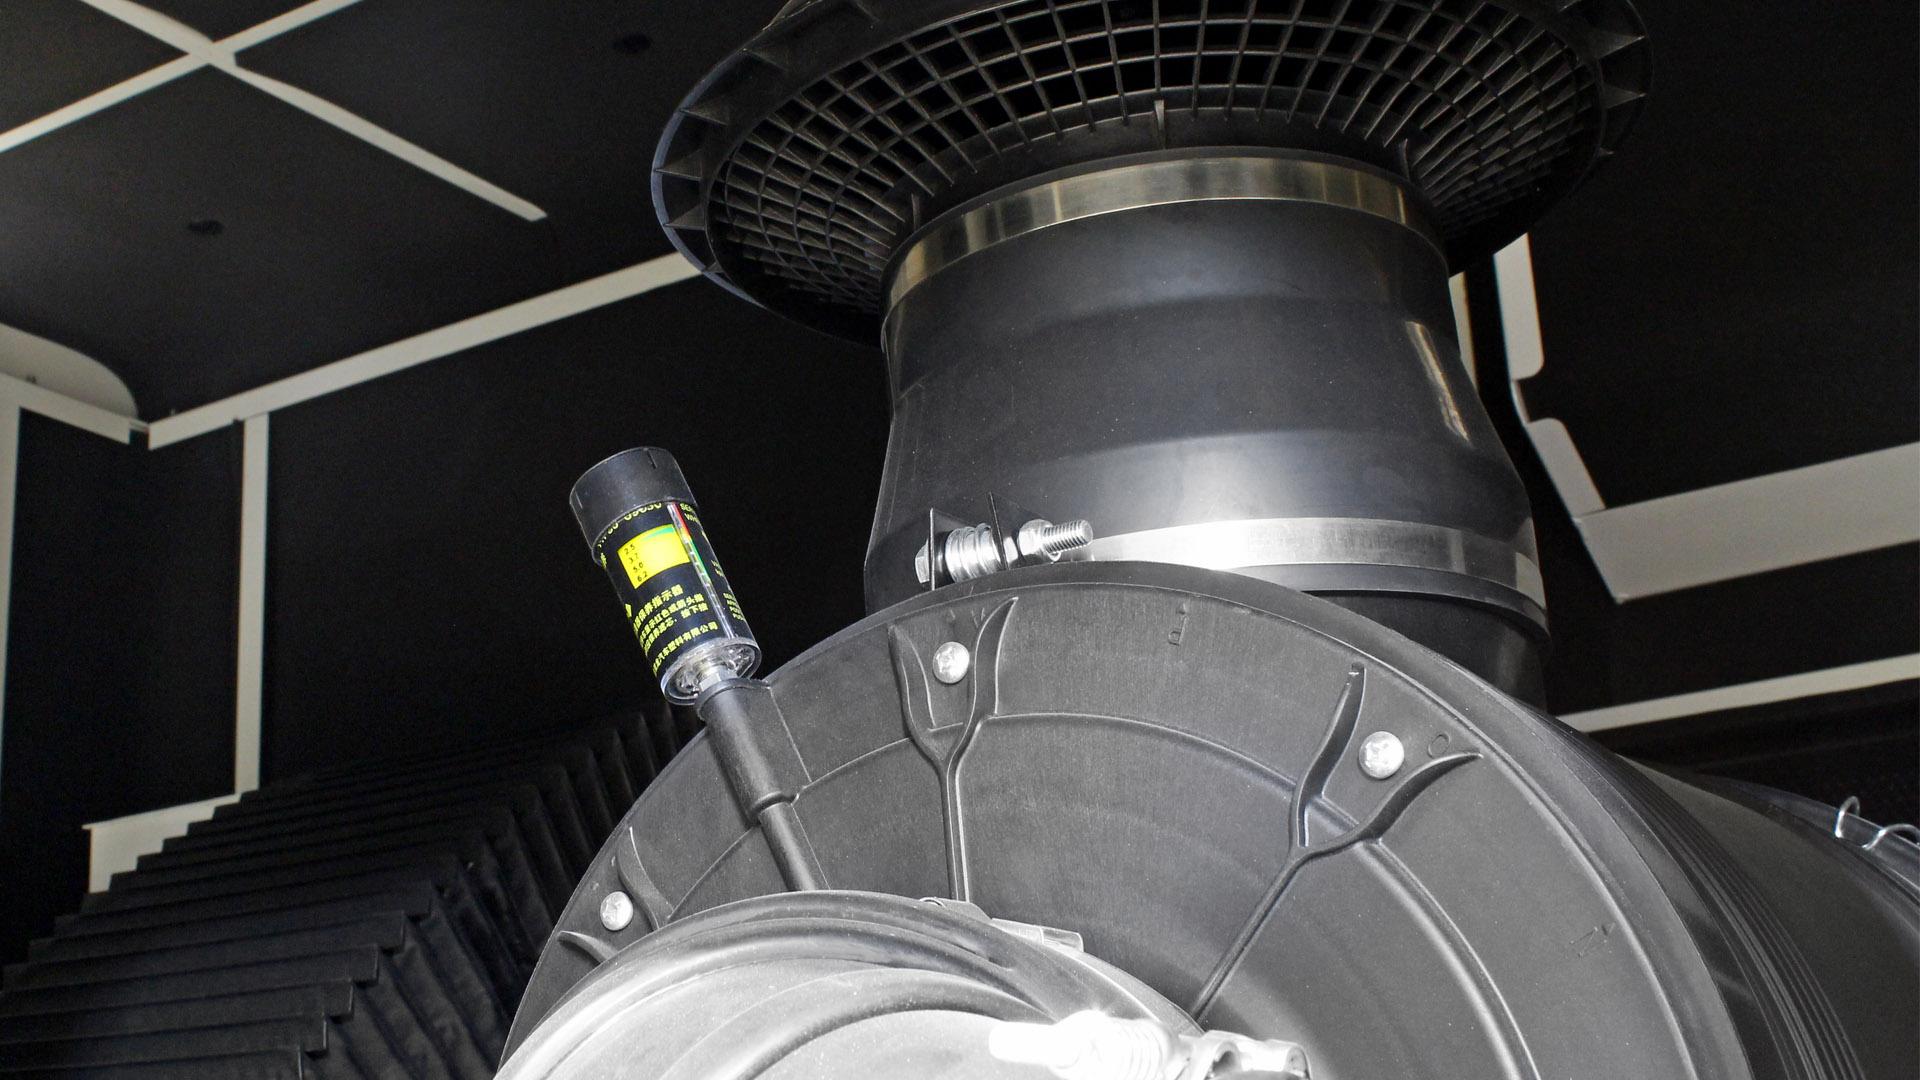 Turbo Pressure Gauge on Evopower Generators with Cummins 6ZTAA13 engine